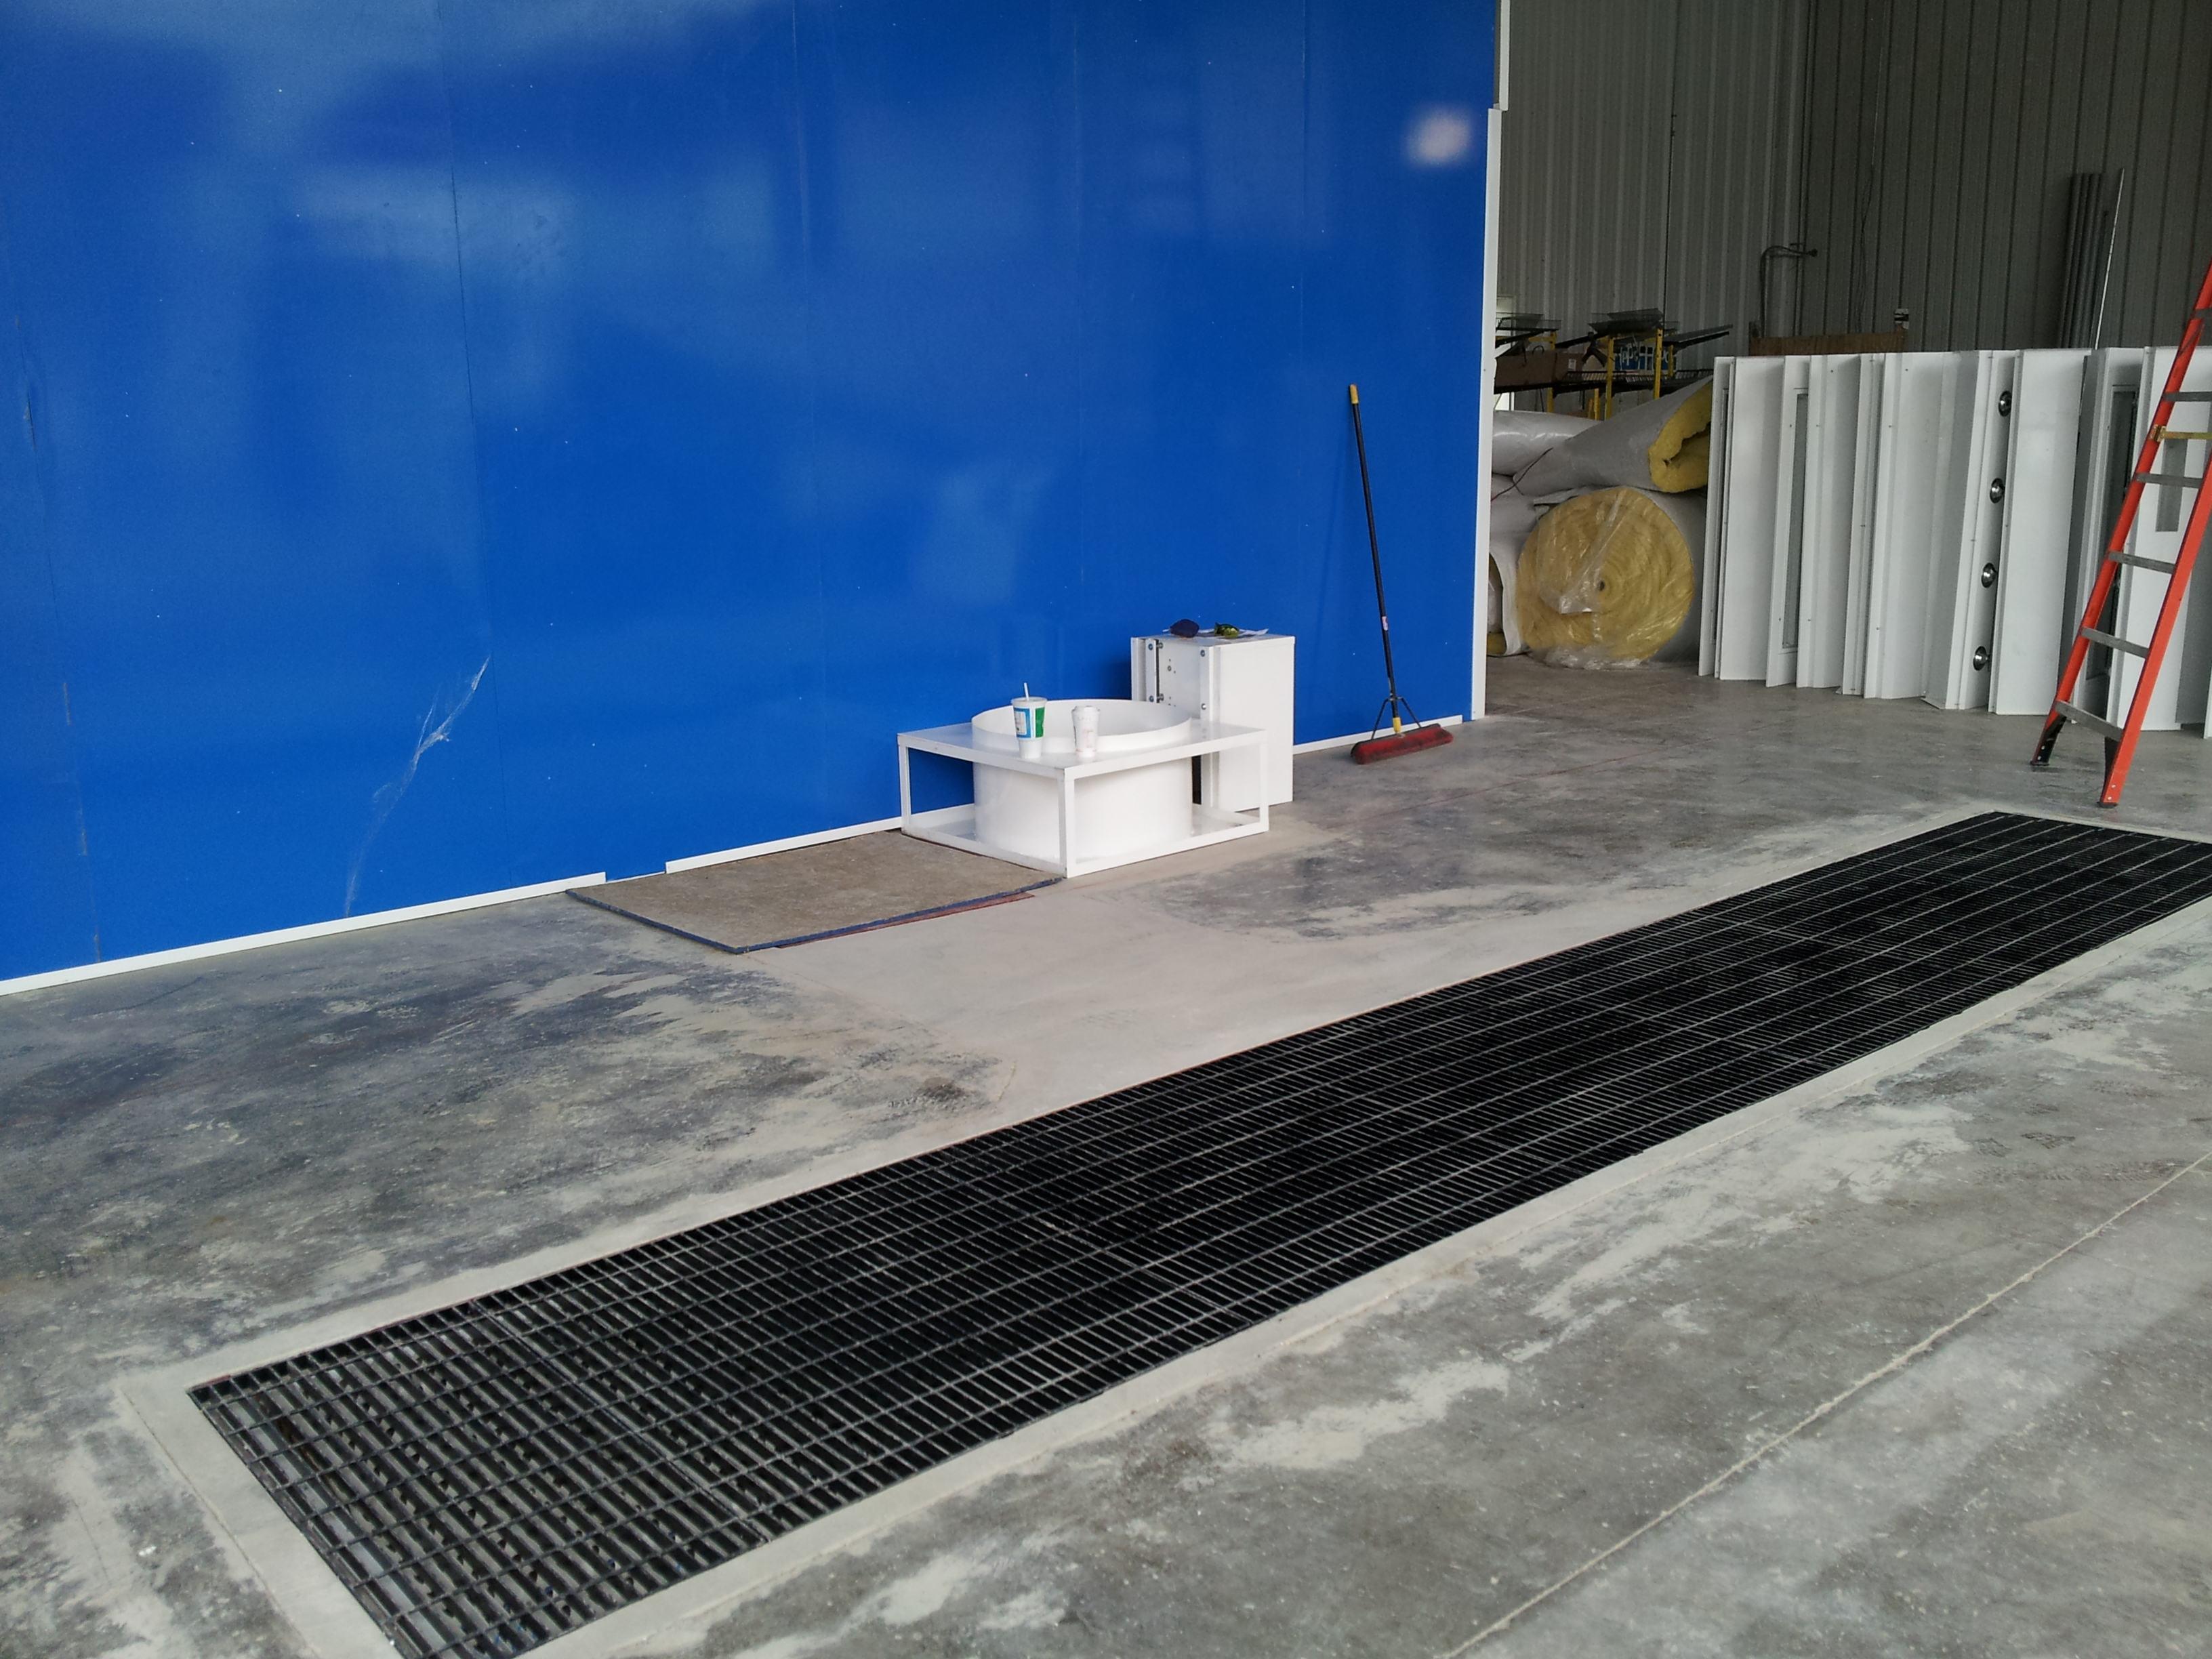 dalby spray booth wiring diagram wiring diagram dataSpray Booth Wiring #11